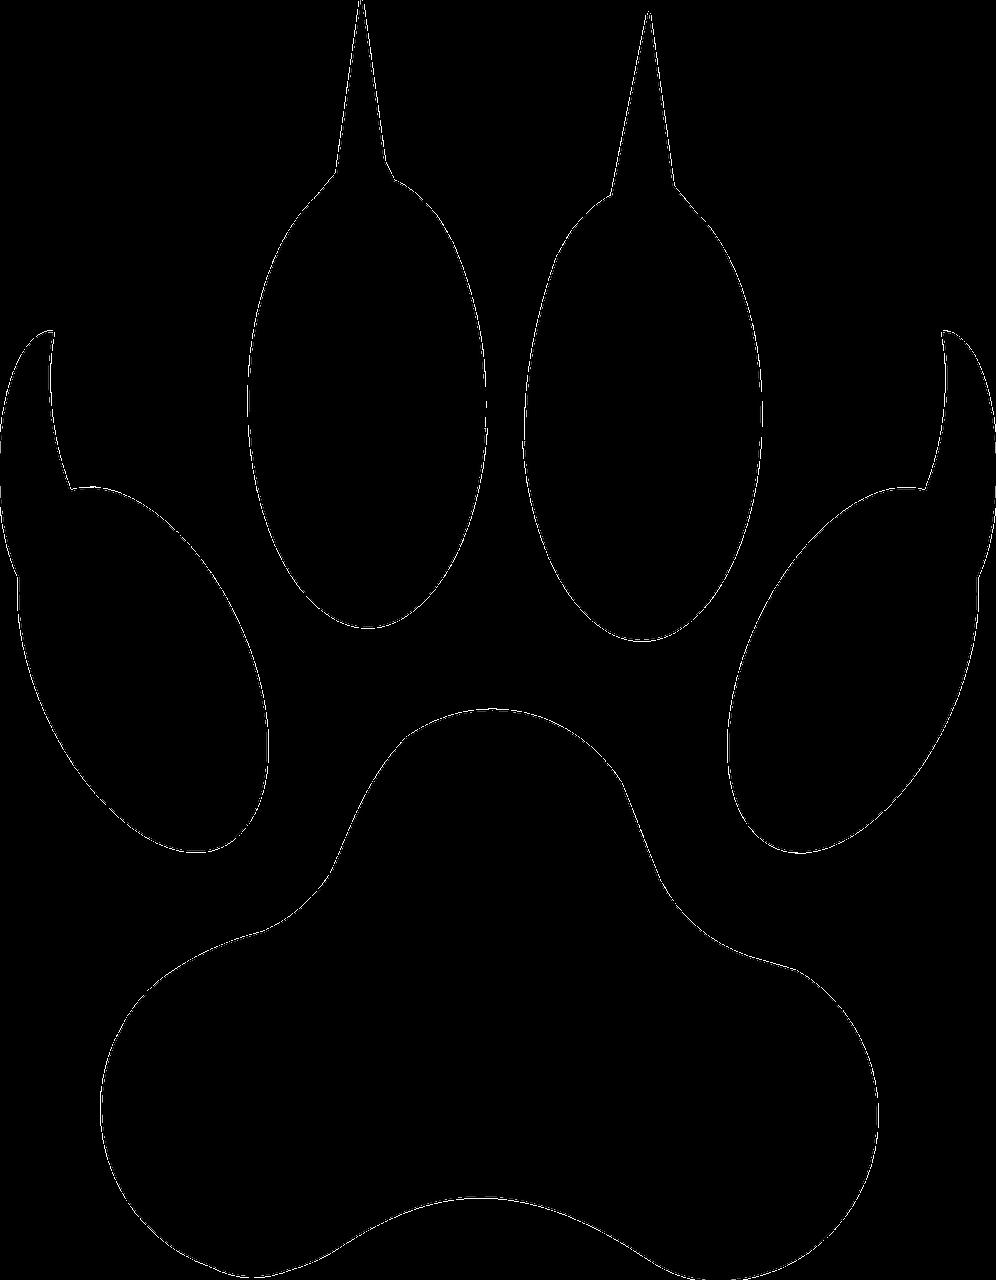 Картинки волчьего следа